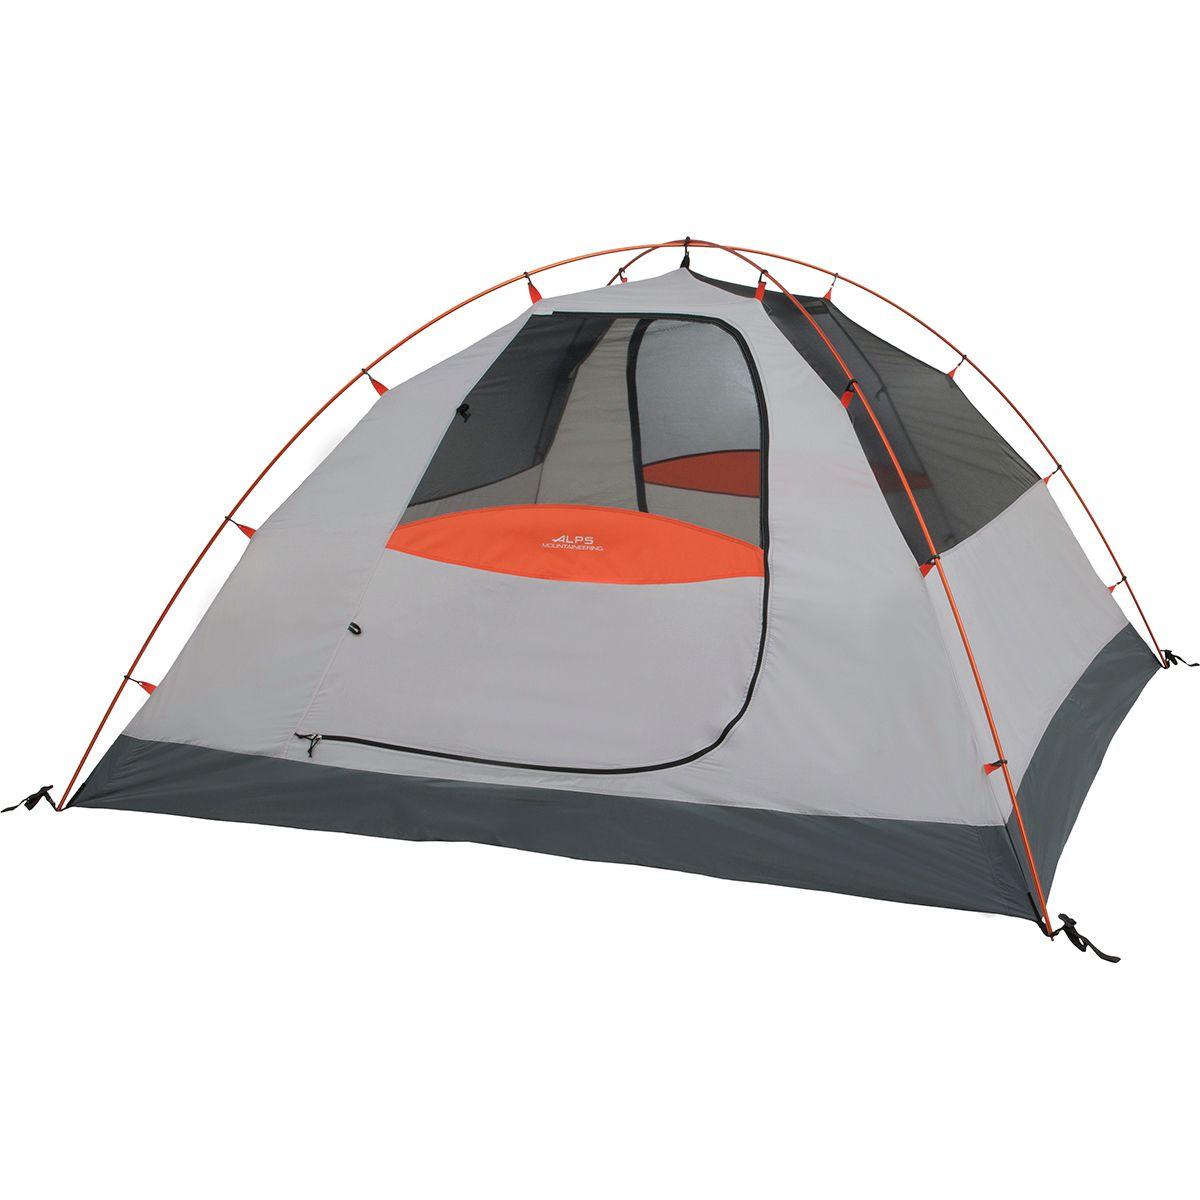 ALPS Mountaineering Koda 3 Tent (3-person, 3-season) $85 + Free Shipping